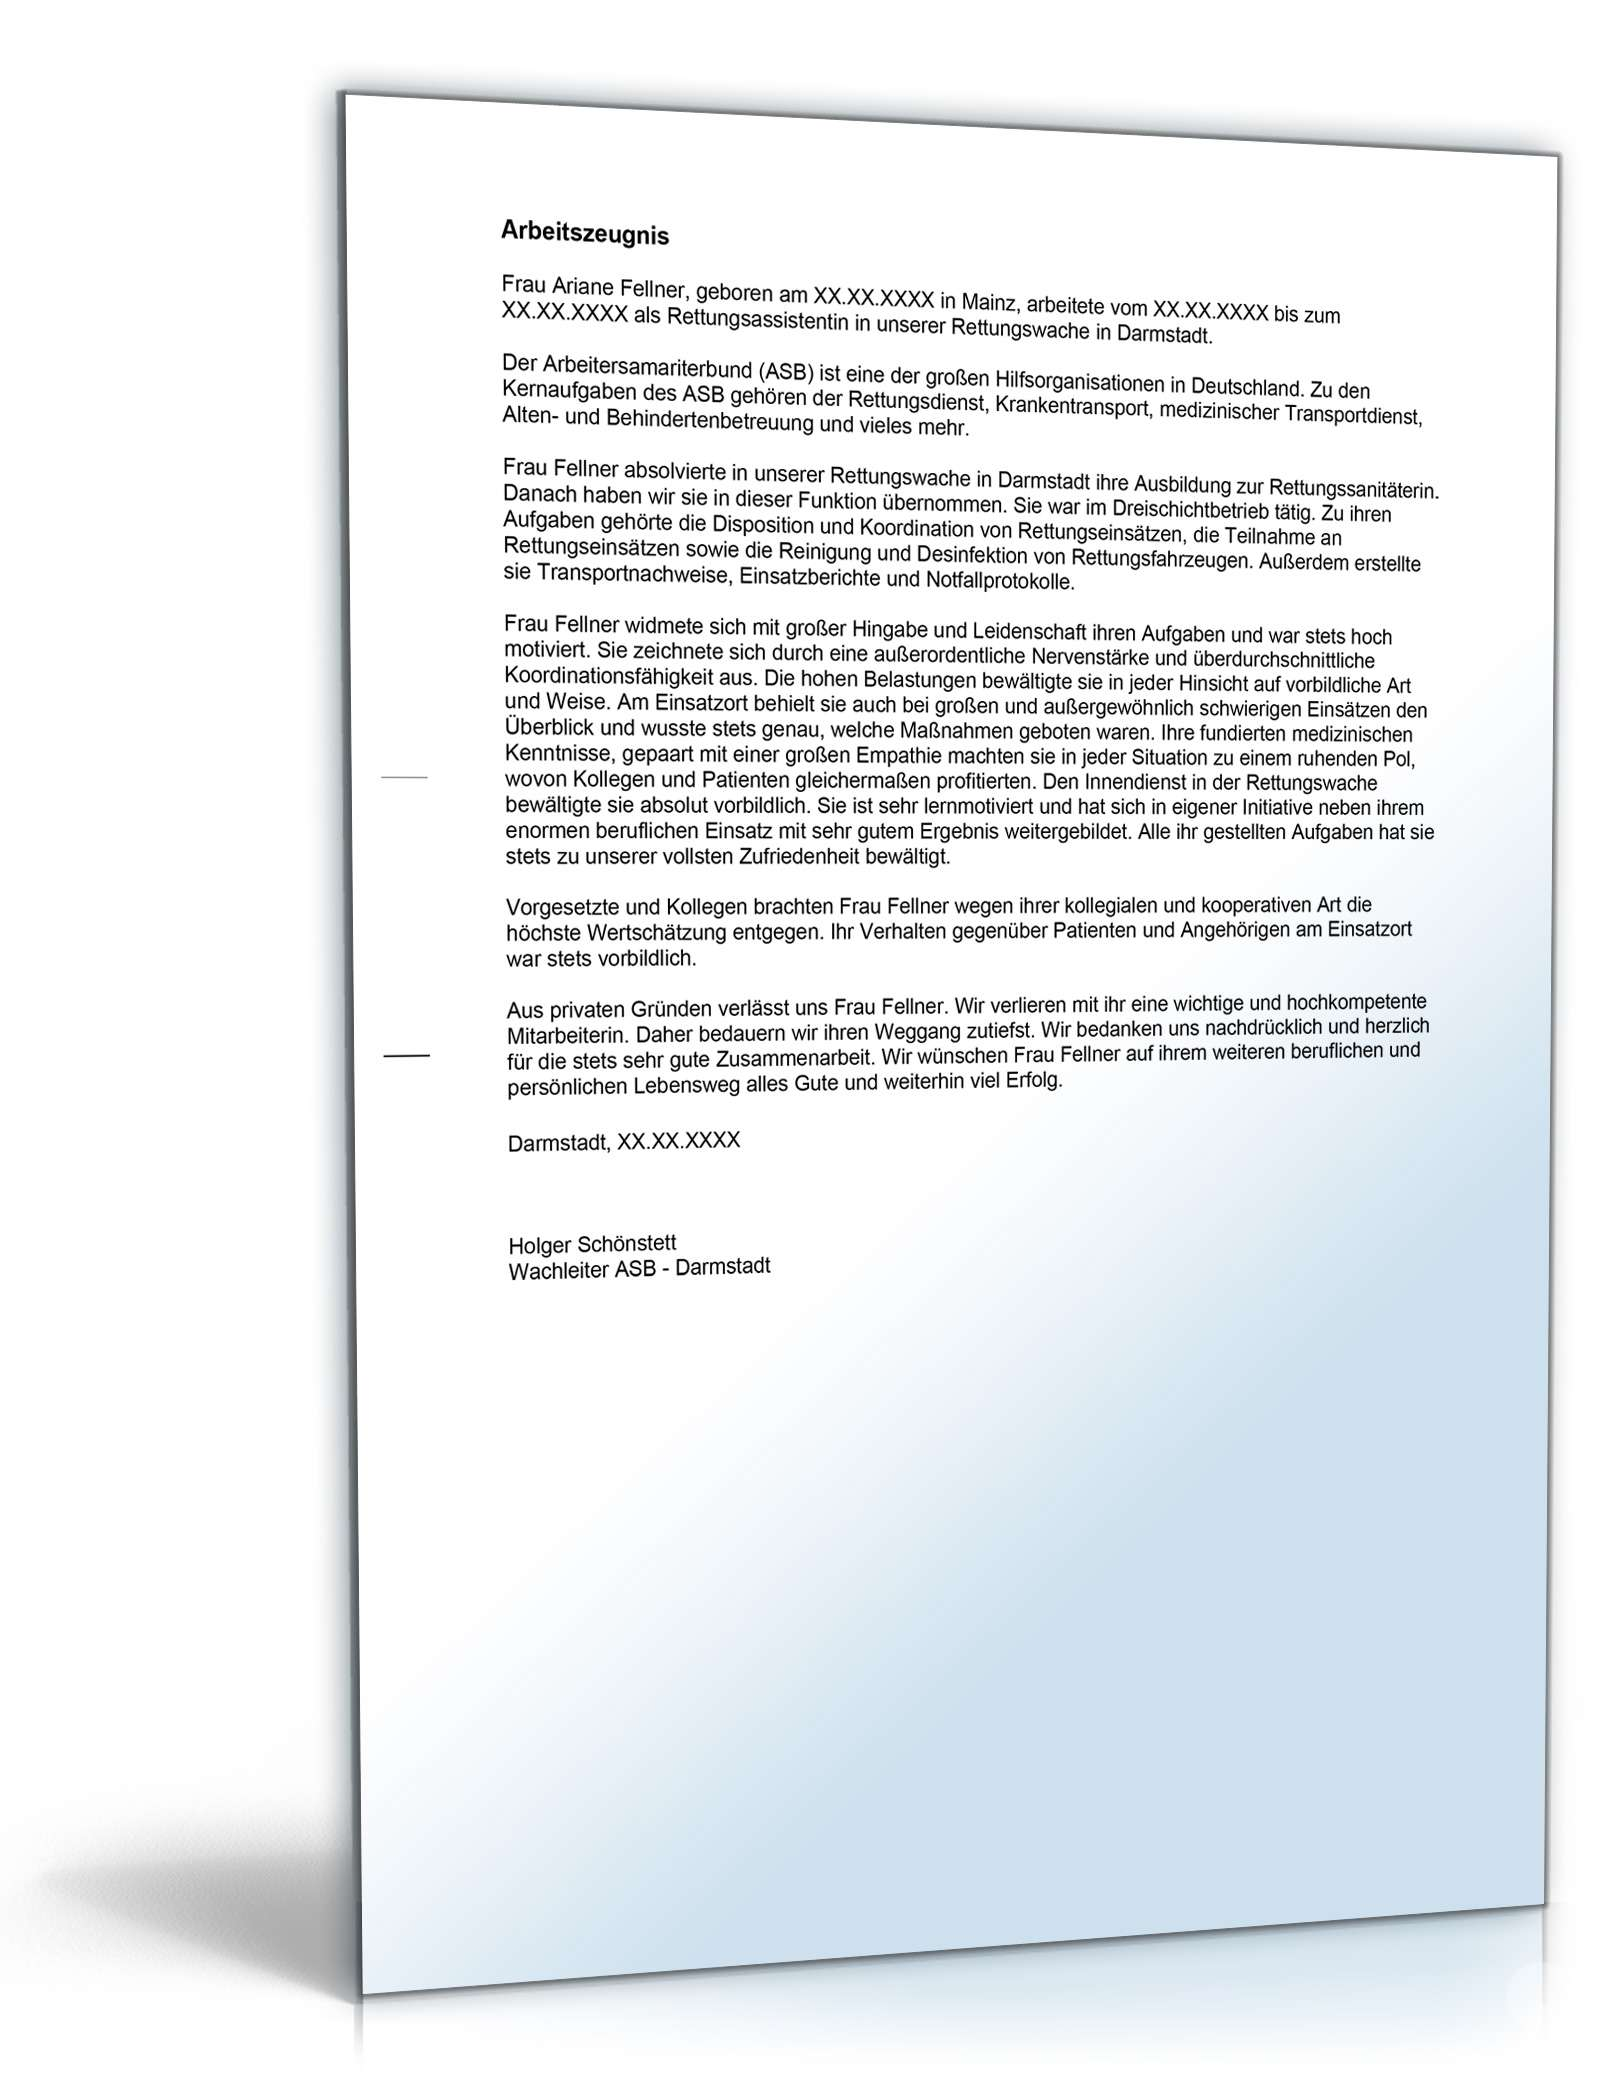 Outstanding Reinigung Business Lebenslauf Picture Collection ...